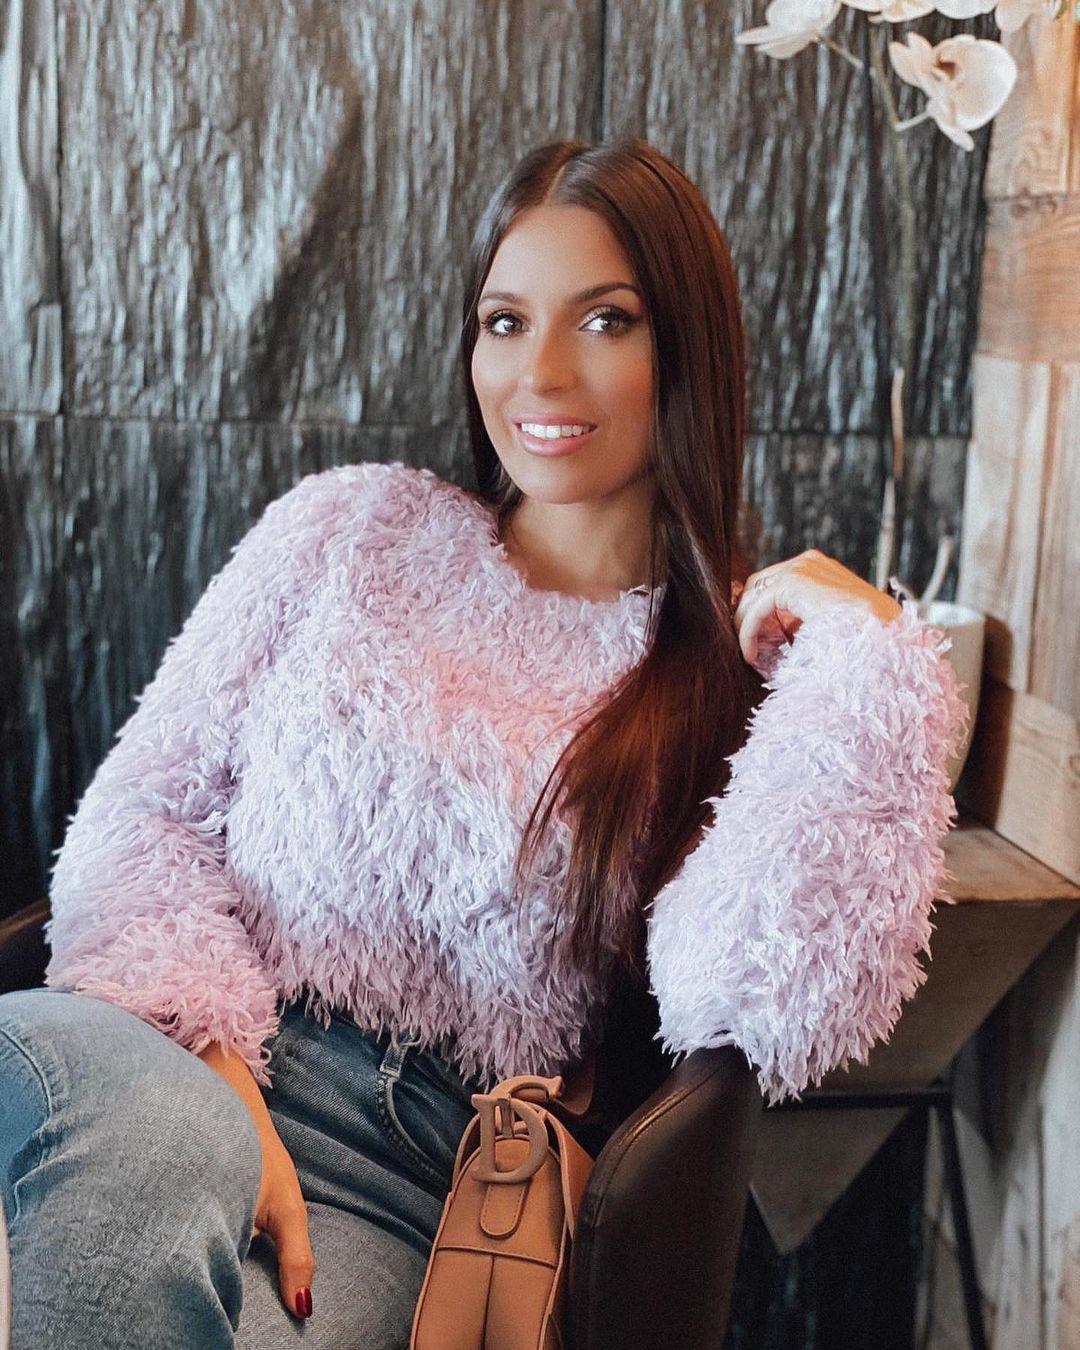 Alessia-Macari-Wallpapers-Insta-Fit-Bio-1